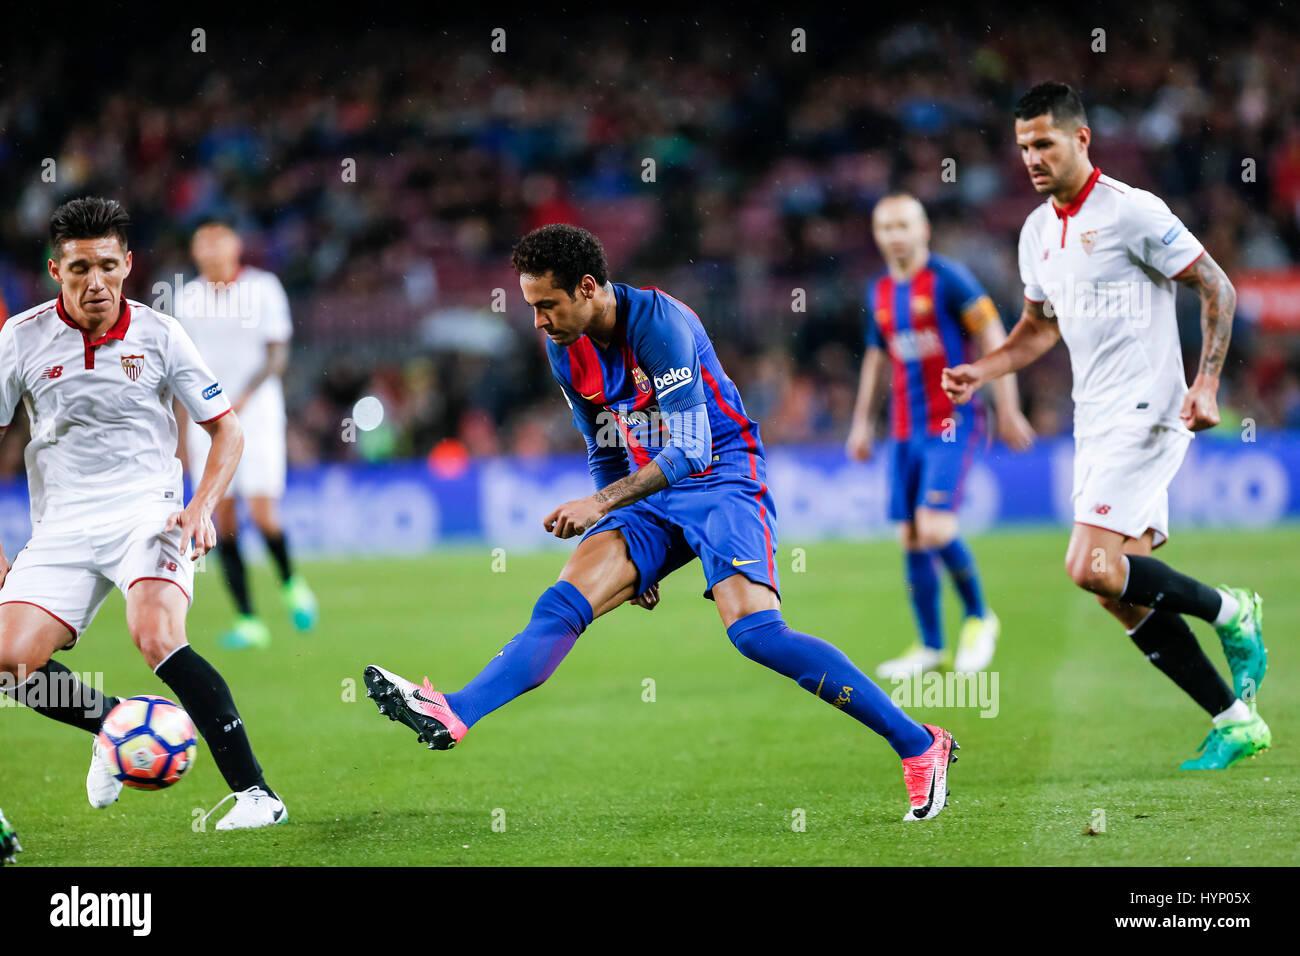 April 5, 2017: Neymar jr during the match between FC Barcelona vs Sevilla, for the round 30 of the Liga Santander, - Stock Image